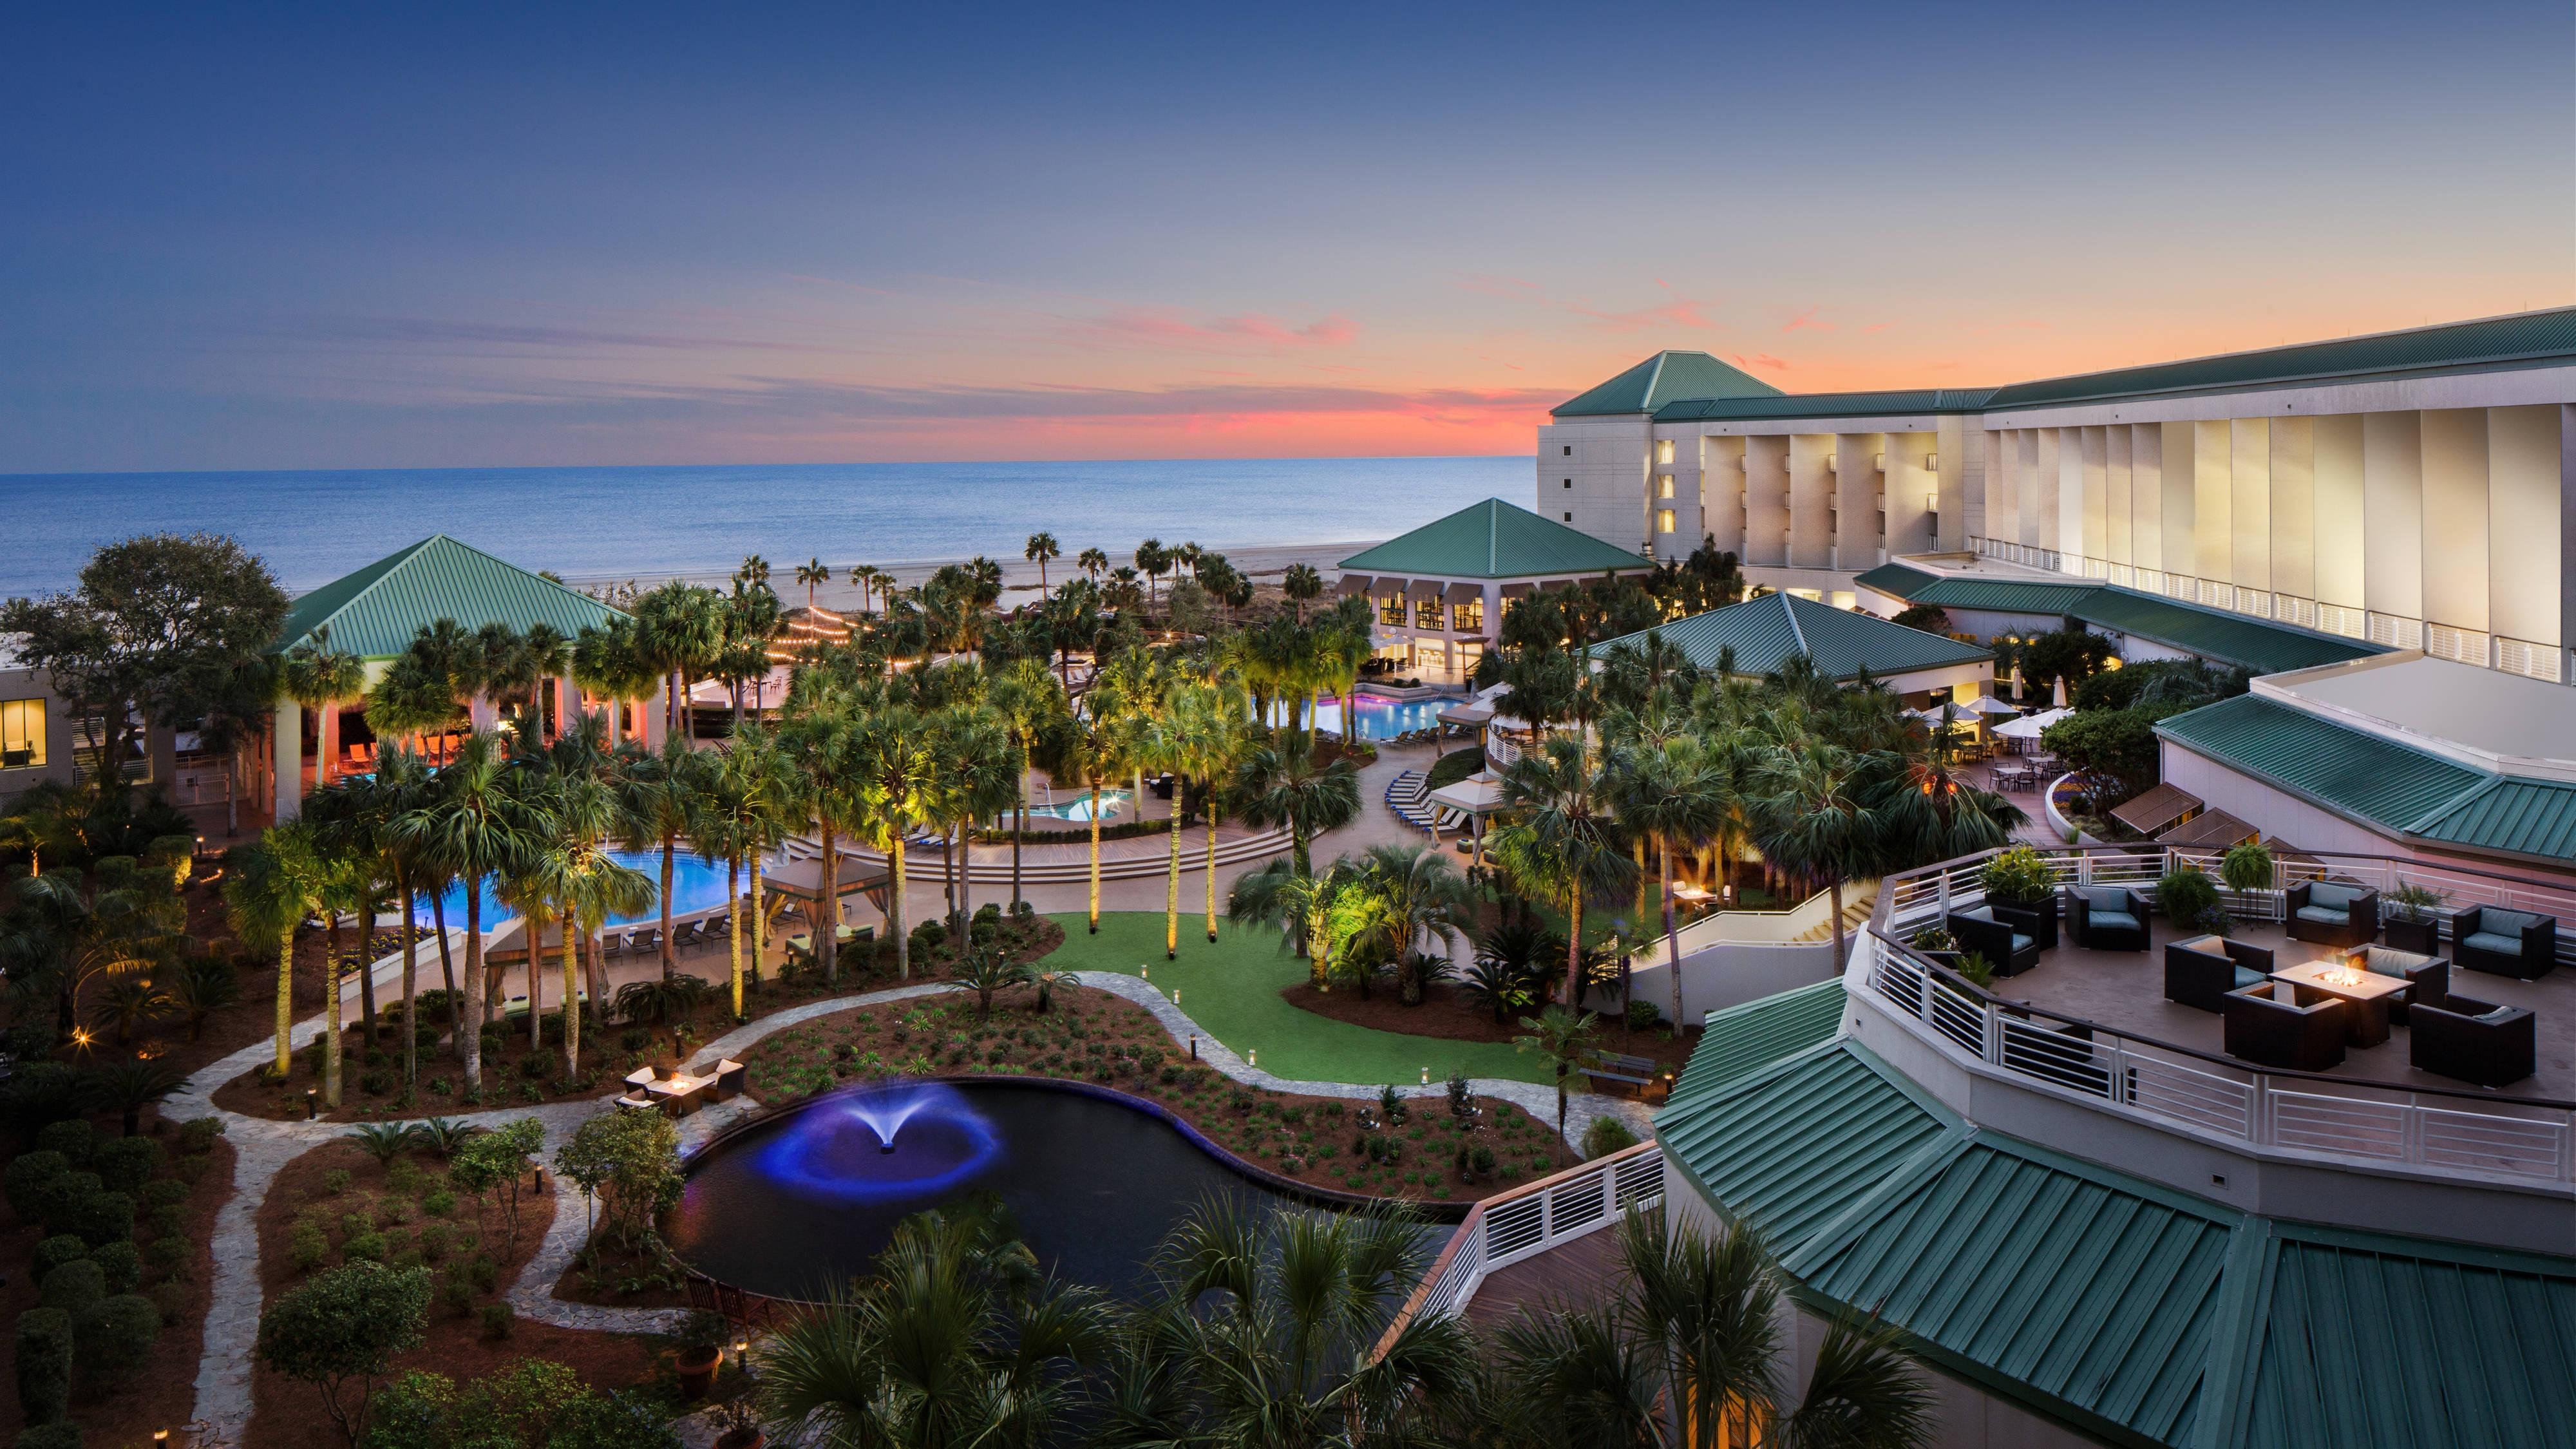 Accompany Head Thai Massage Island Hilton